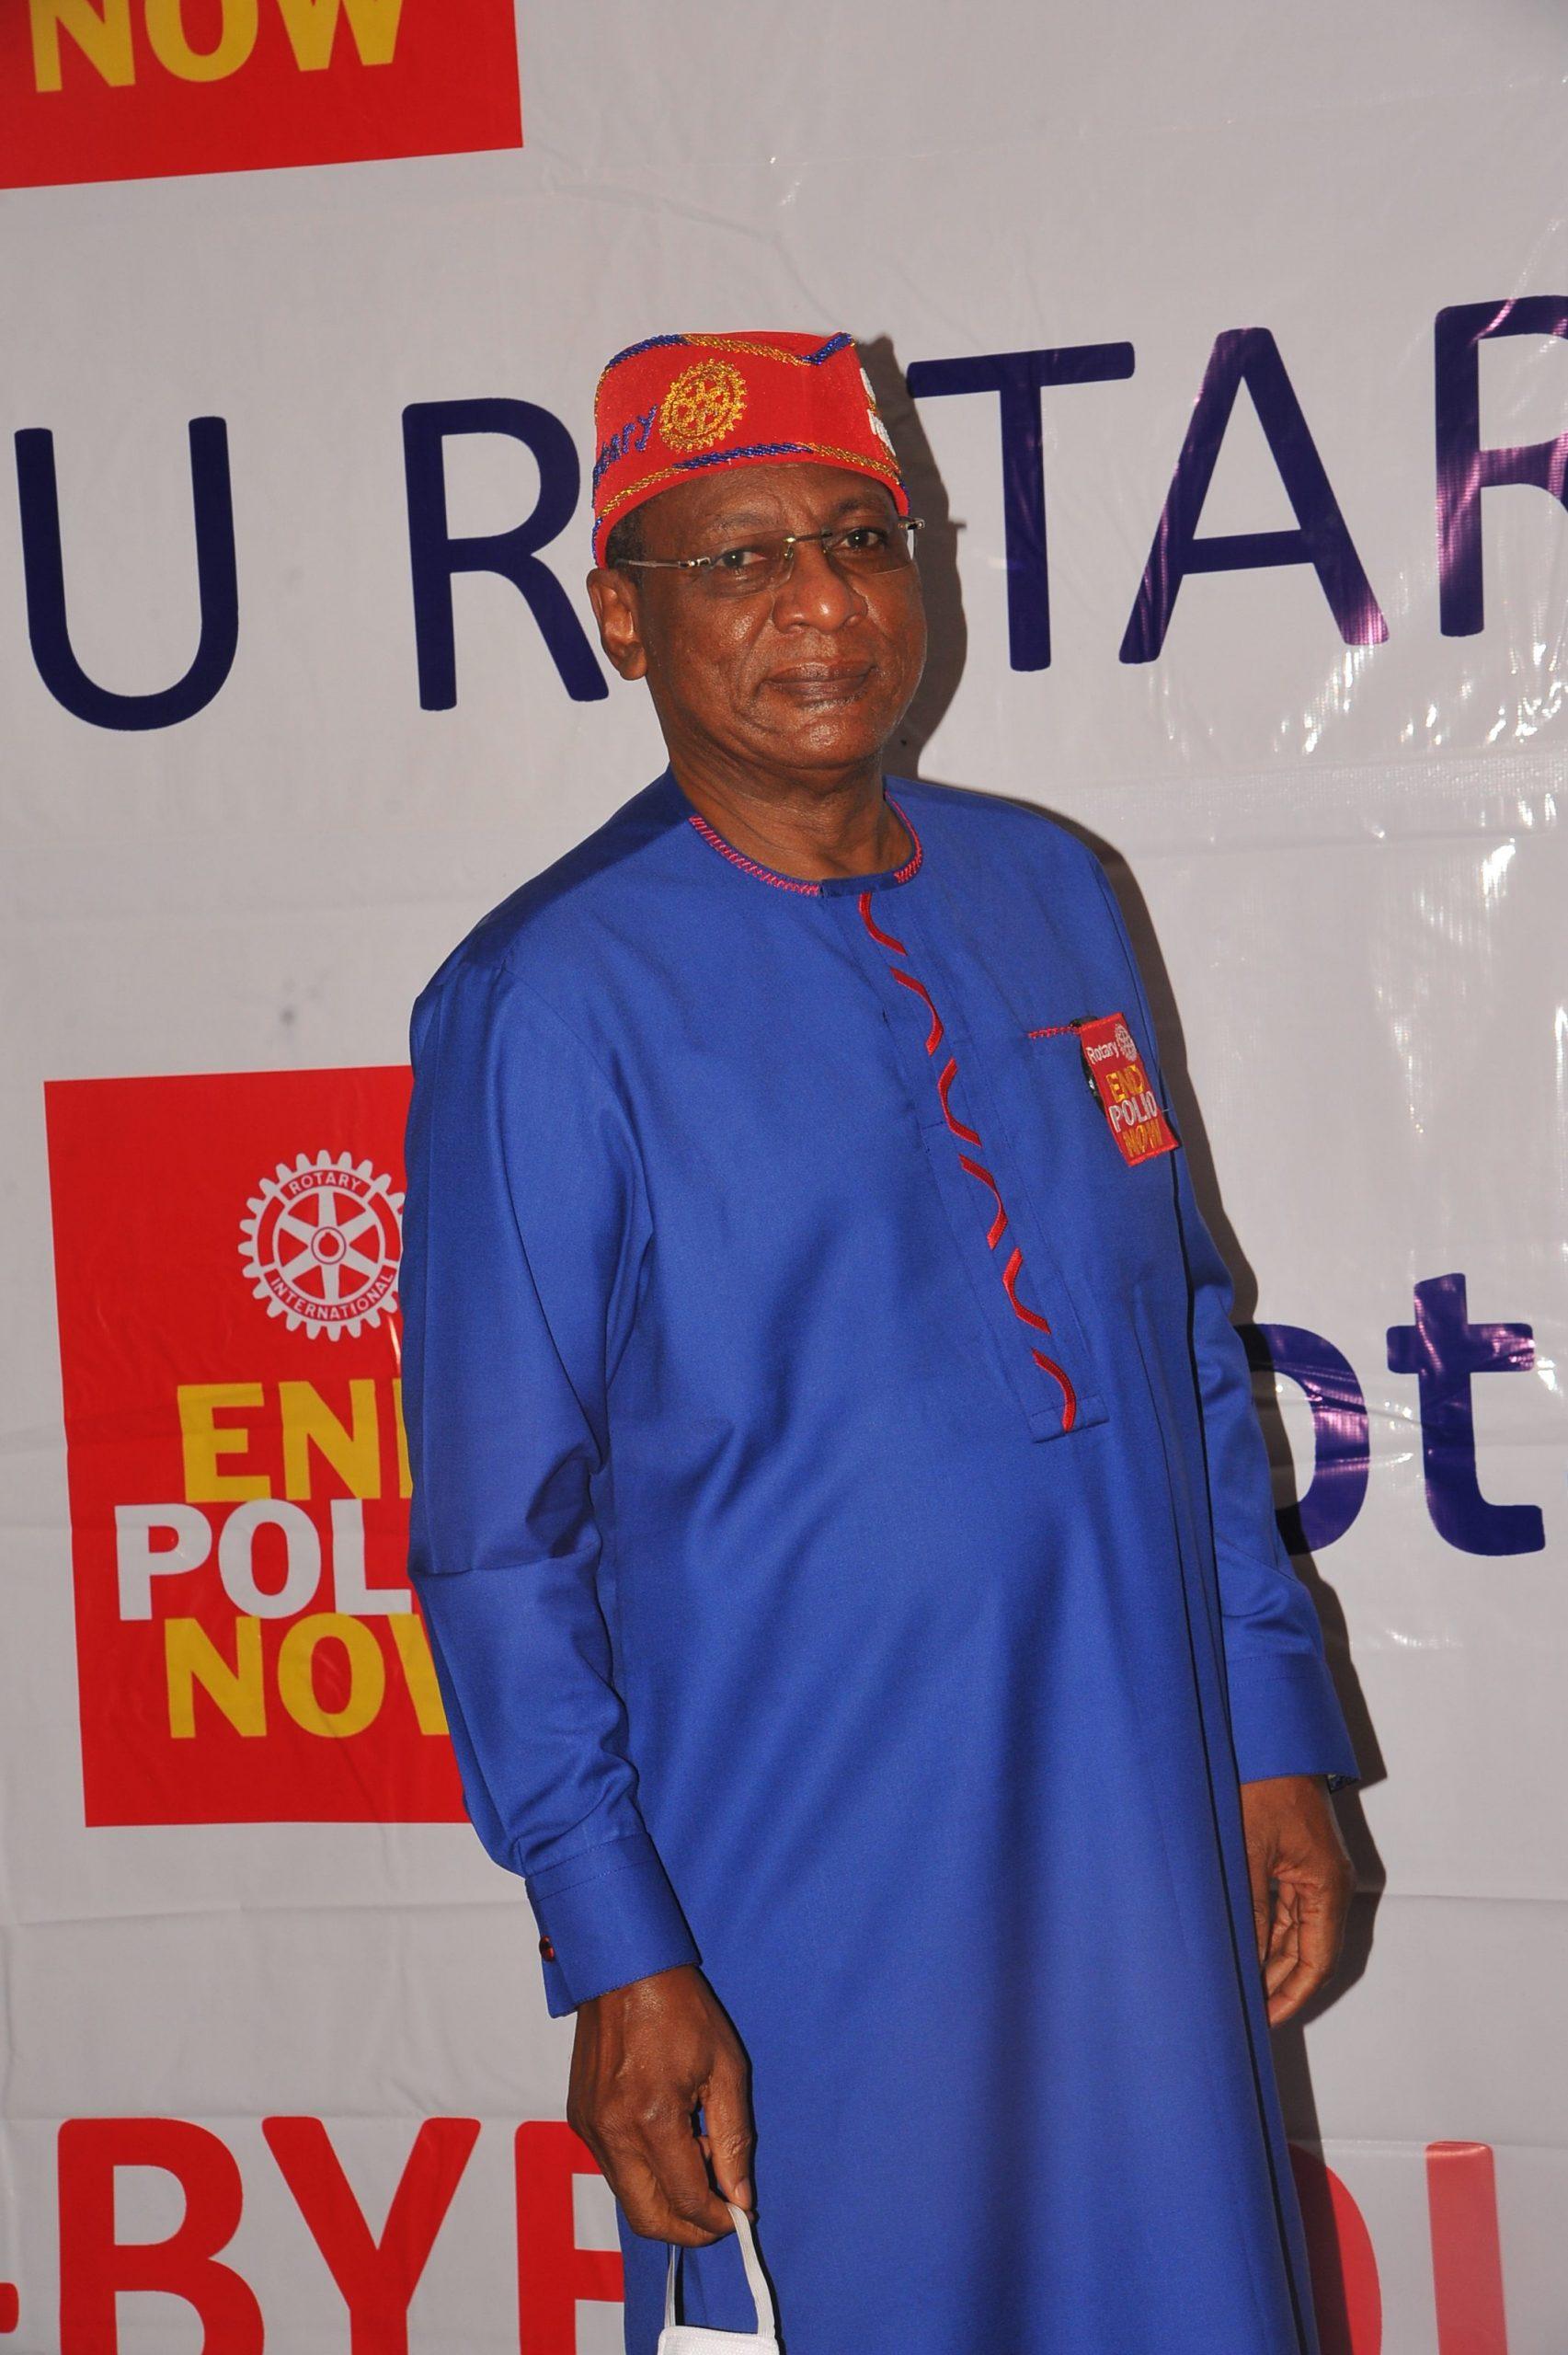 Nigeria National Polioplus Committee Chairman : Dr Tunji Funsho